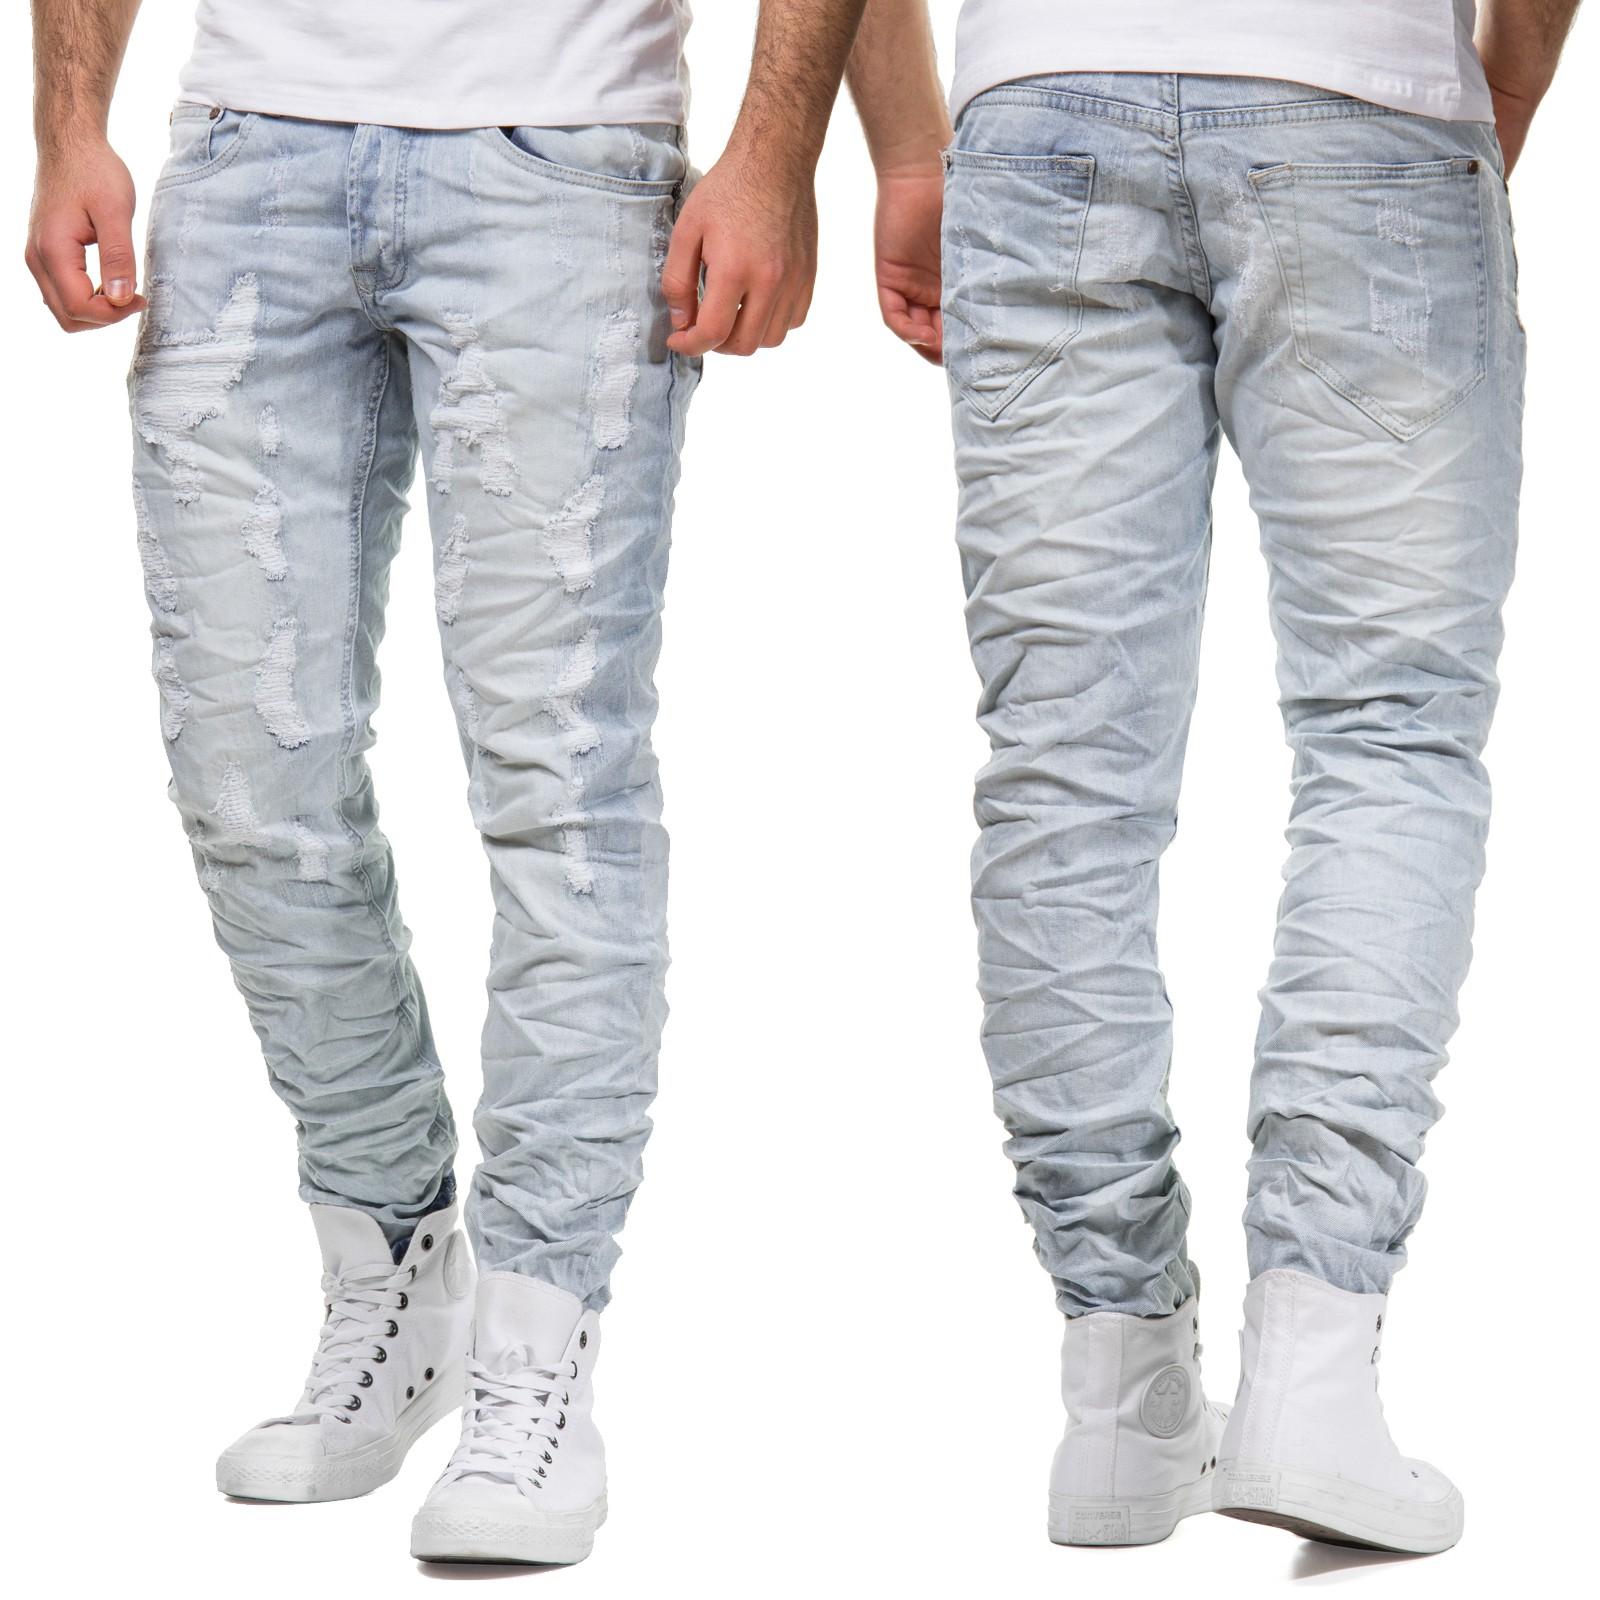 one public 6100 herren jeans ripped hose denim slim fit blau destroyed zerrissen. Black Bedroom Furniture Sets. Home Design Ideas